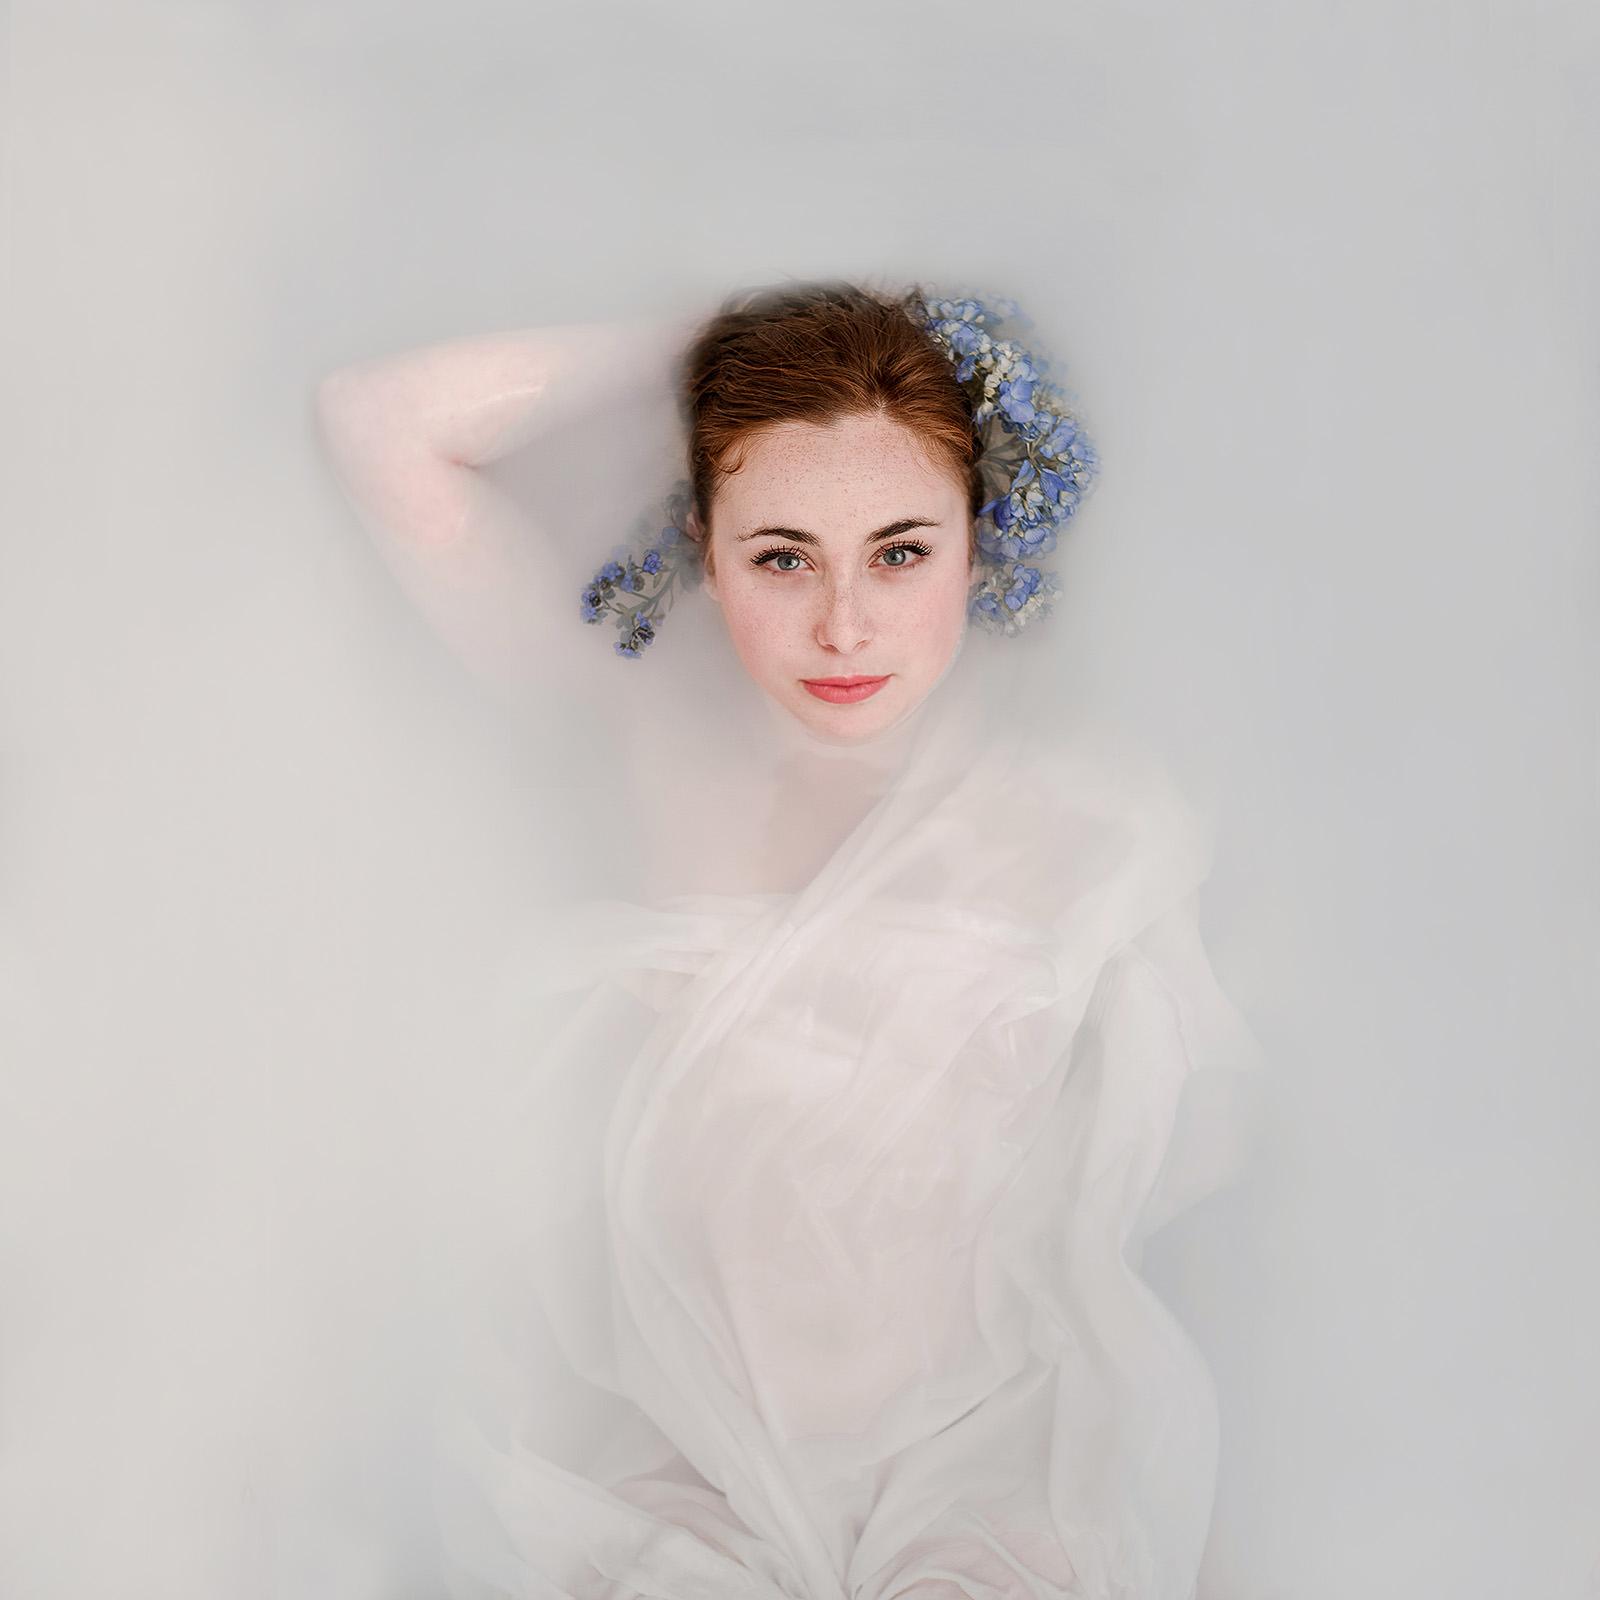 Goddess Milk Bath Portrait of Floriane by Jaclyn Le